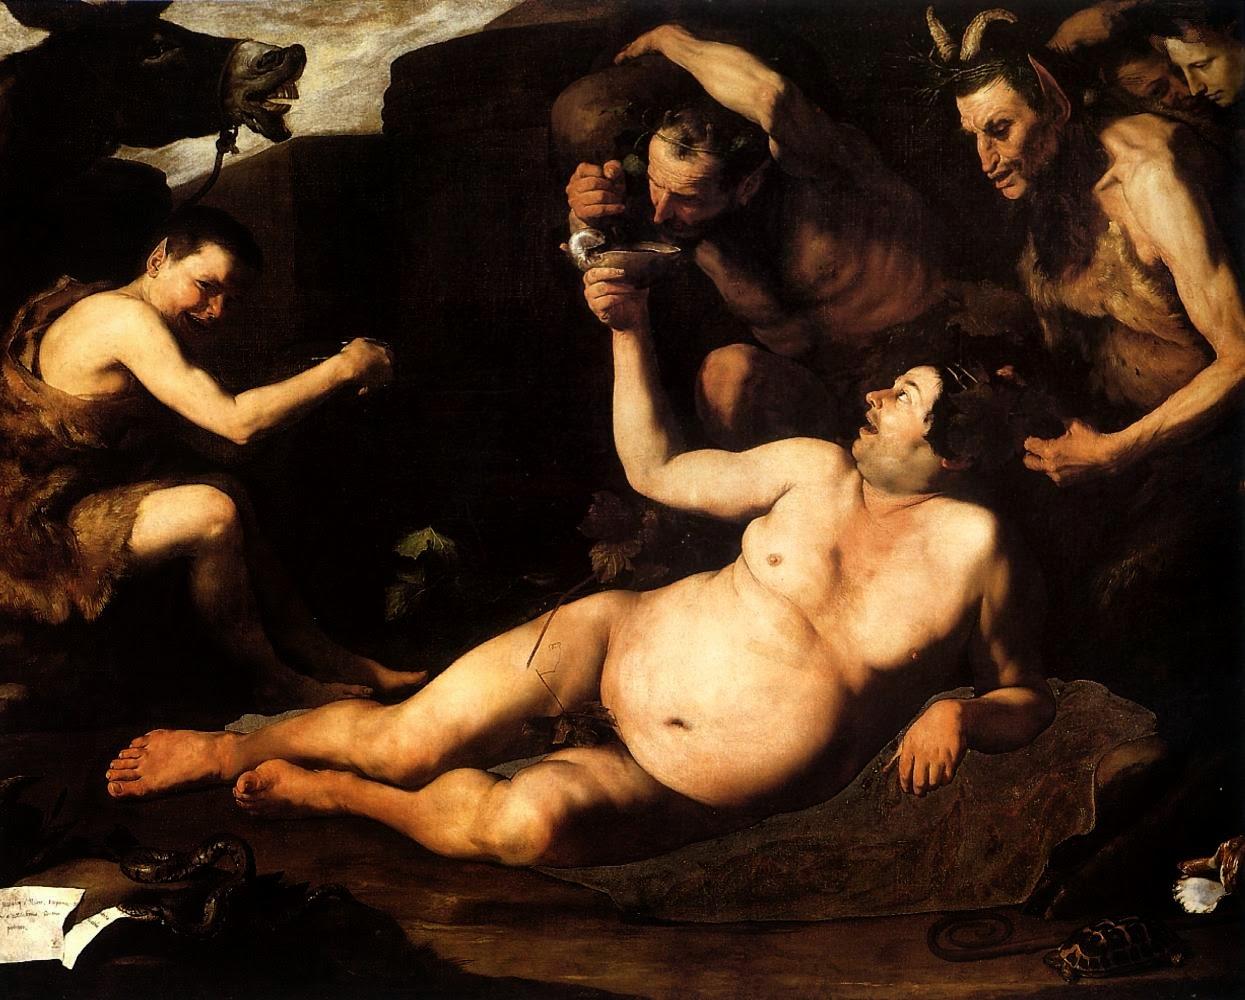 Sileno ebrio (José de Ribera, 1626)